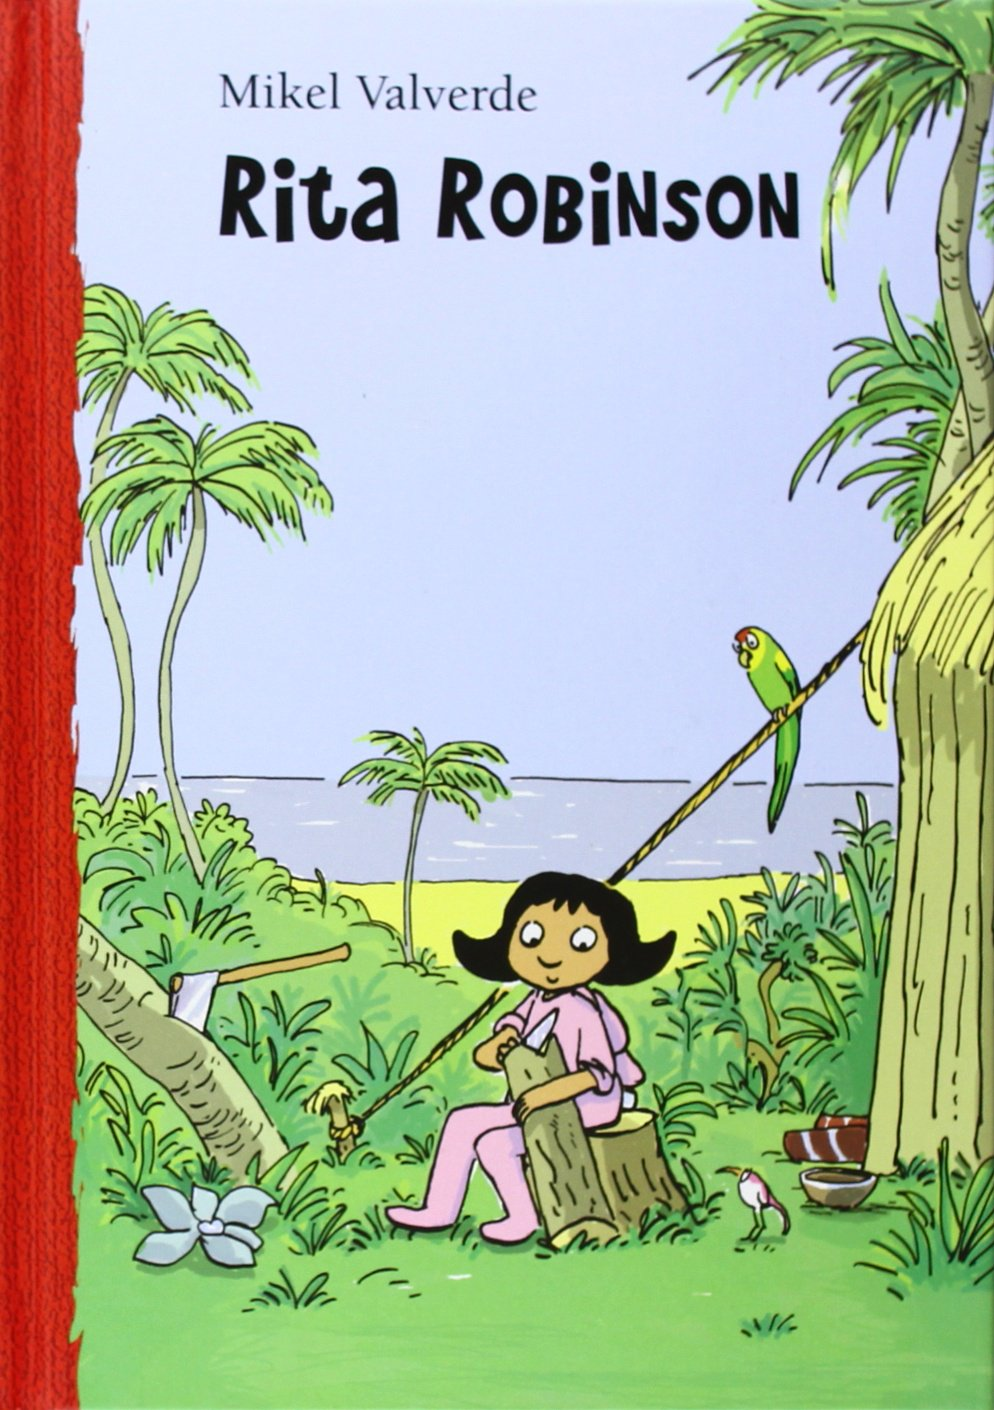 Download Rita Robinson (El Mundo de Rita) (Spanish Edition) PDF